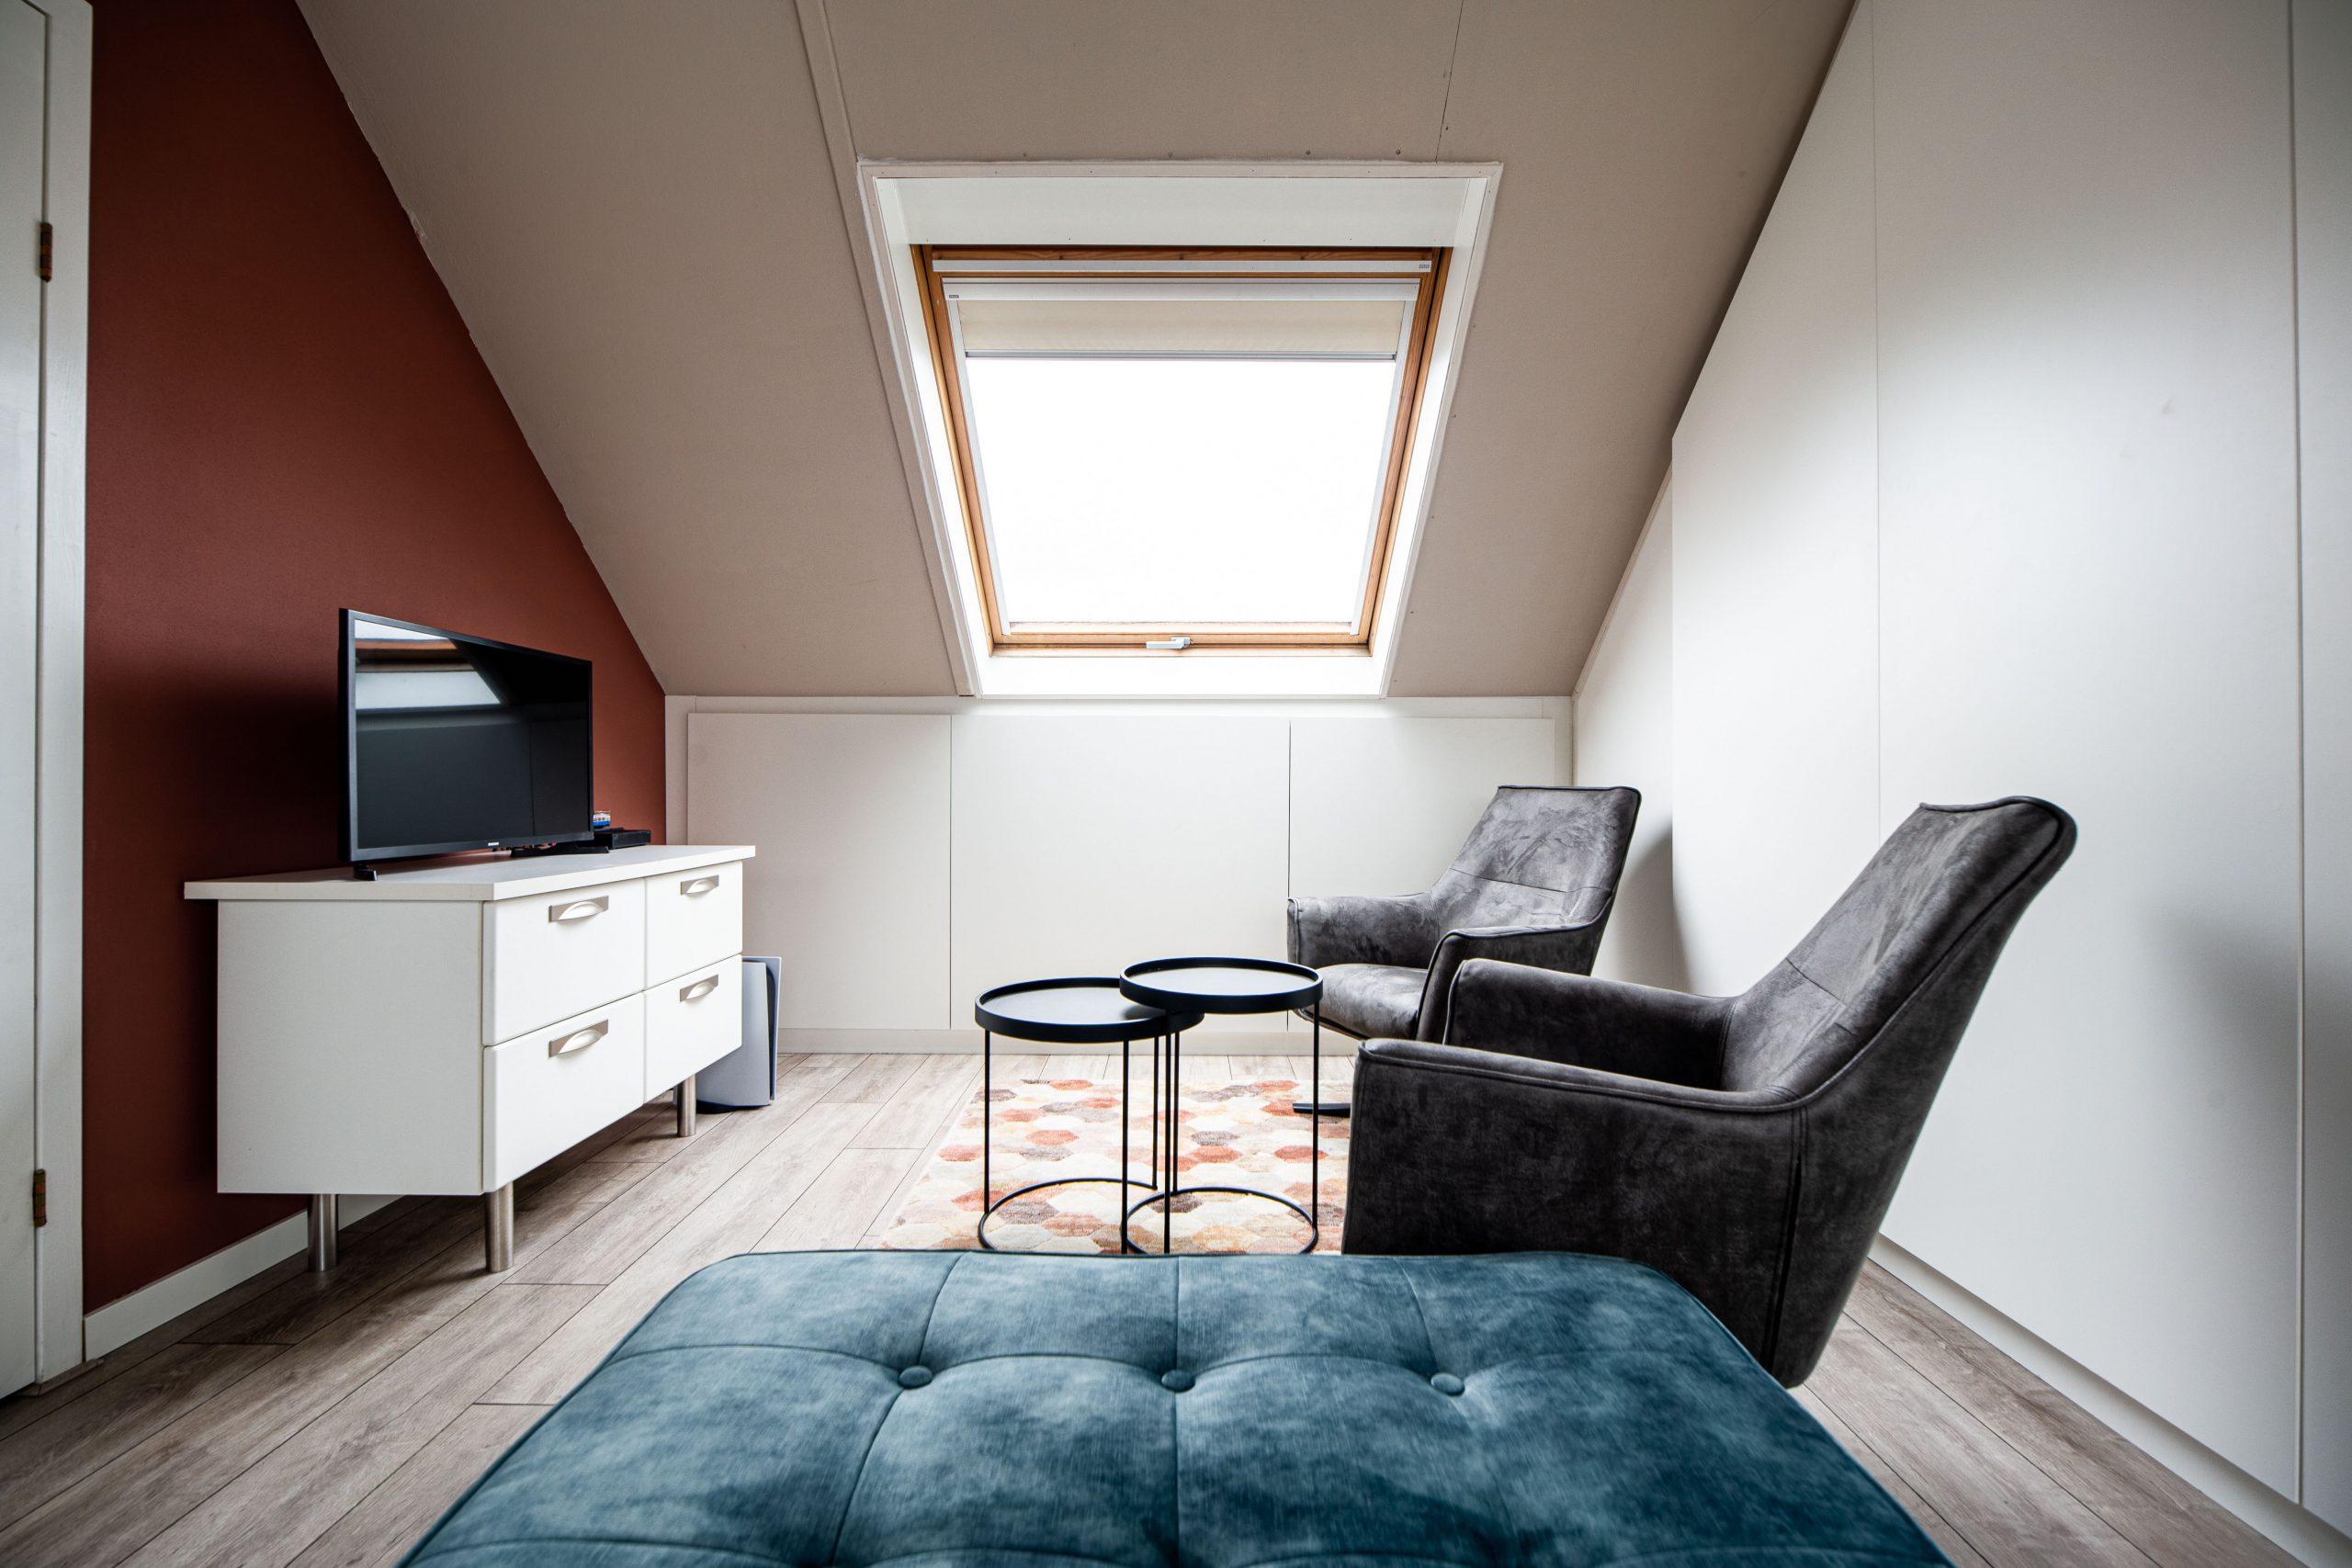 Sens Interieurs - thuiswerkplek op zolder - galerij3